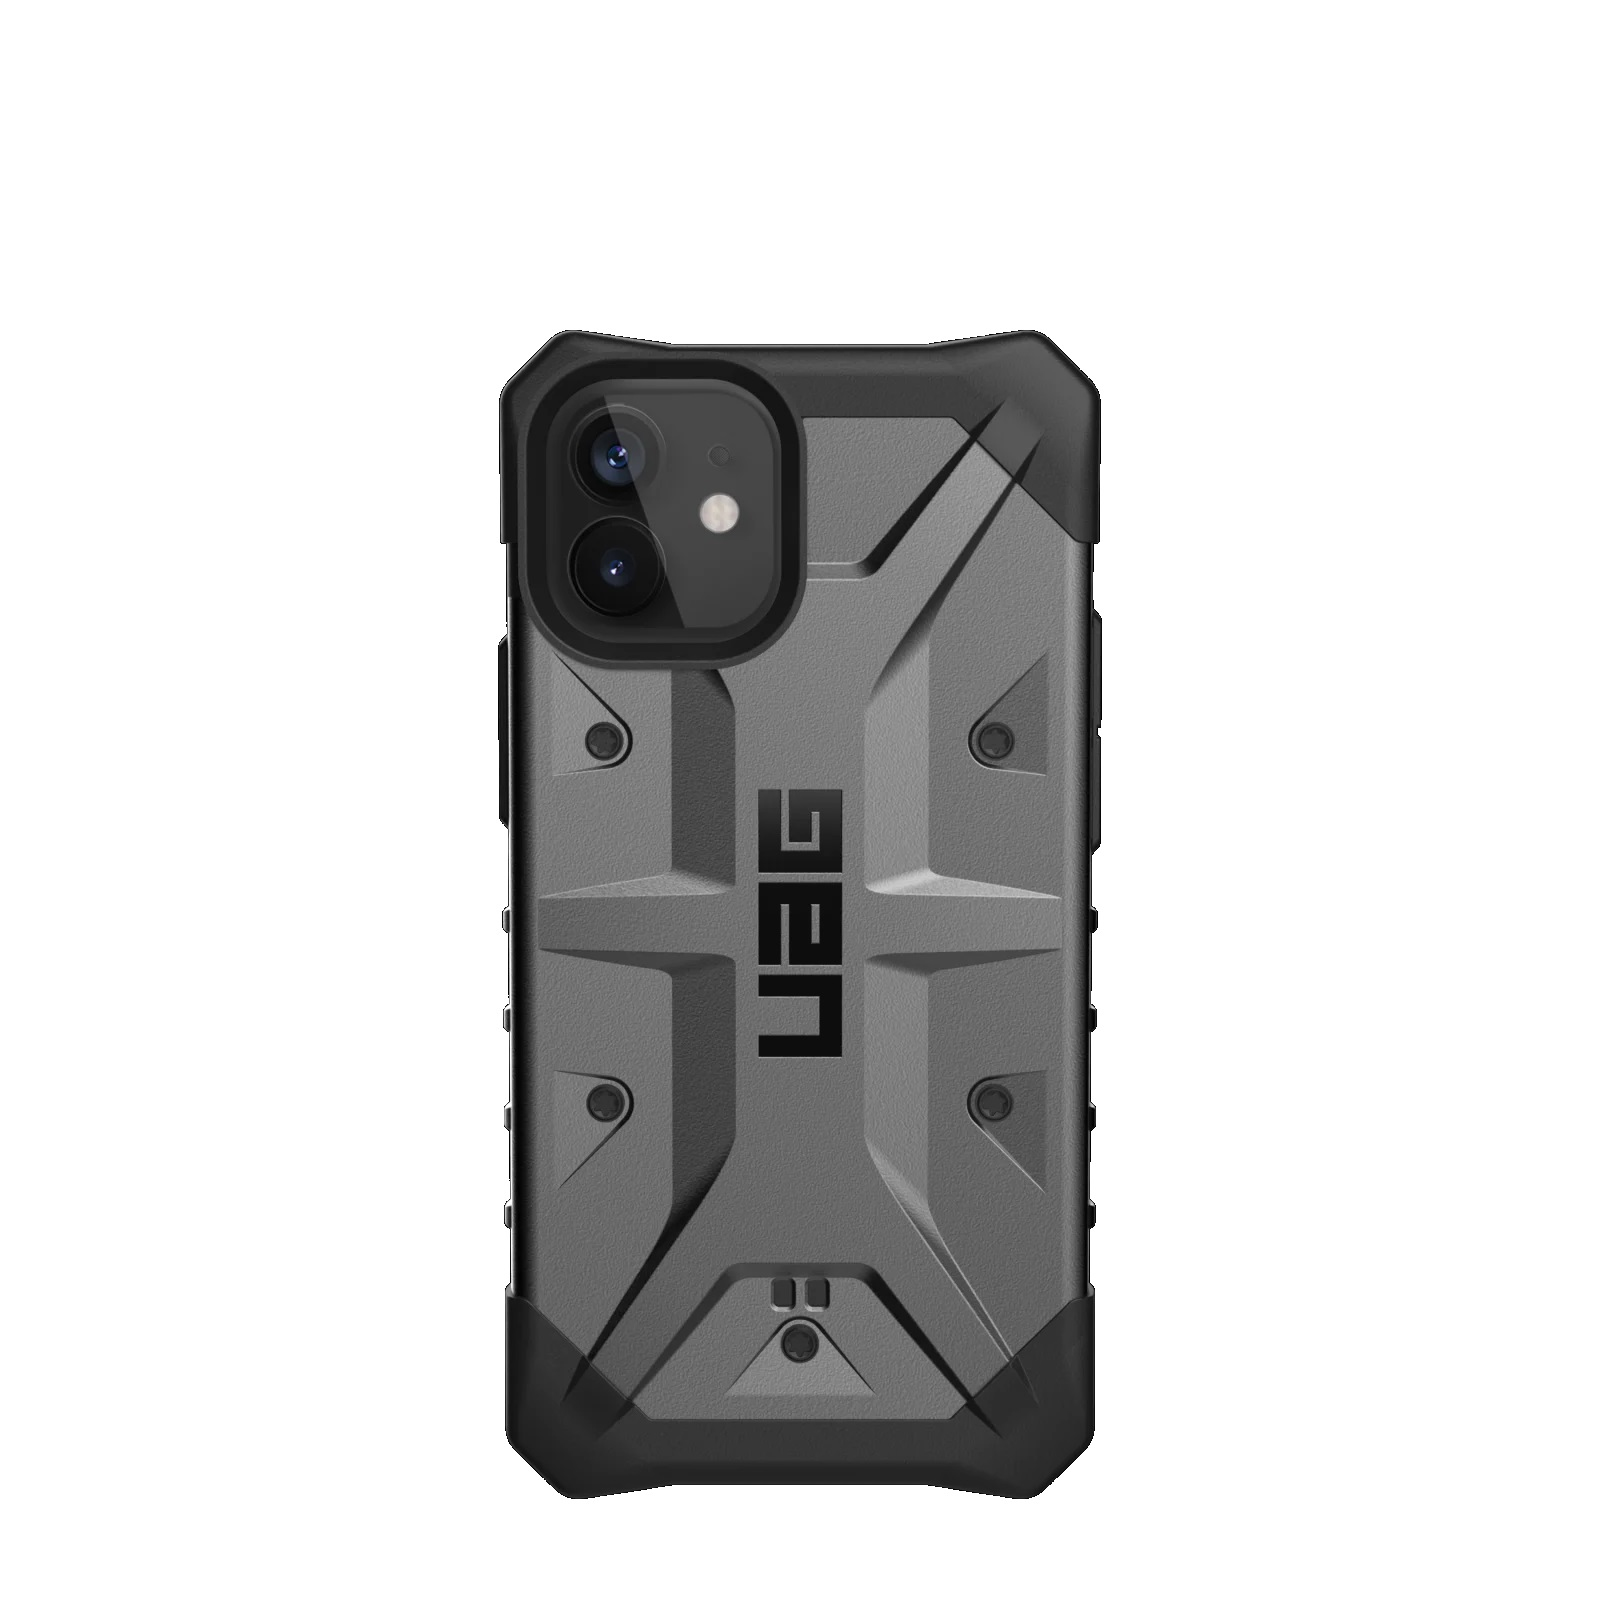 "Urban Armor Gear APPLE MILLENIUM 1 PATHFINDER ACCS funda para teléfono móvil 13,7 cm (5.4"") Negro, Plata"